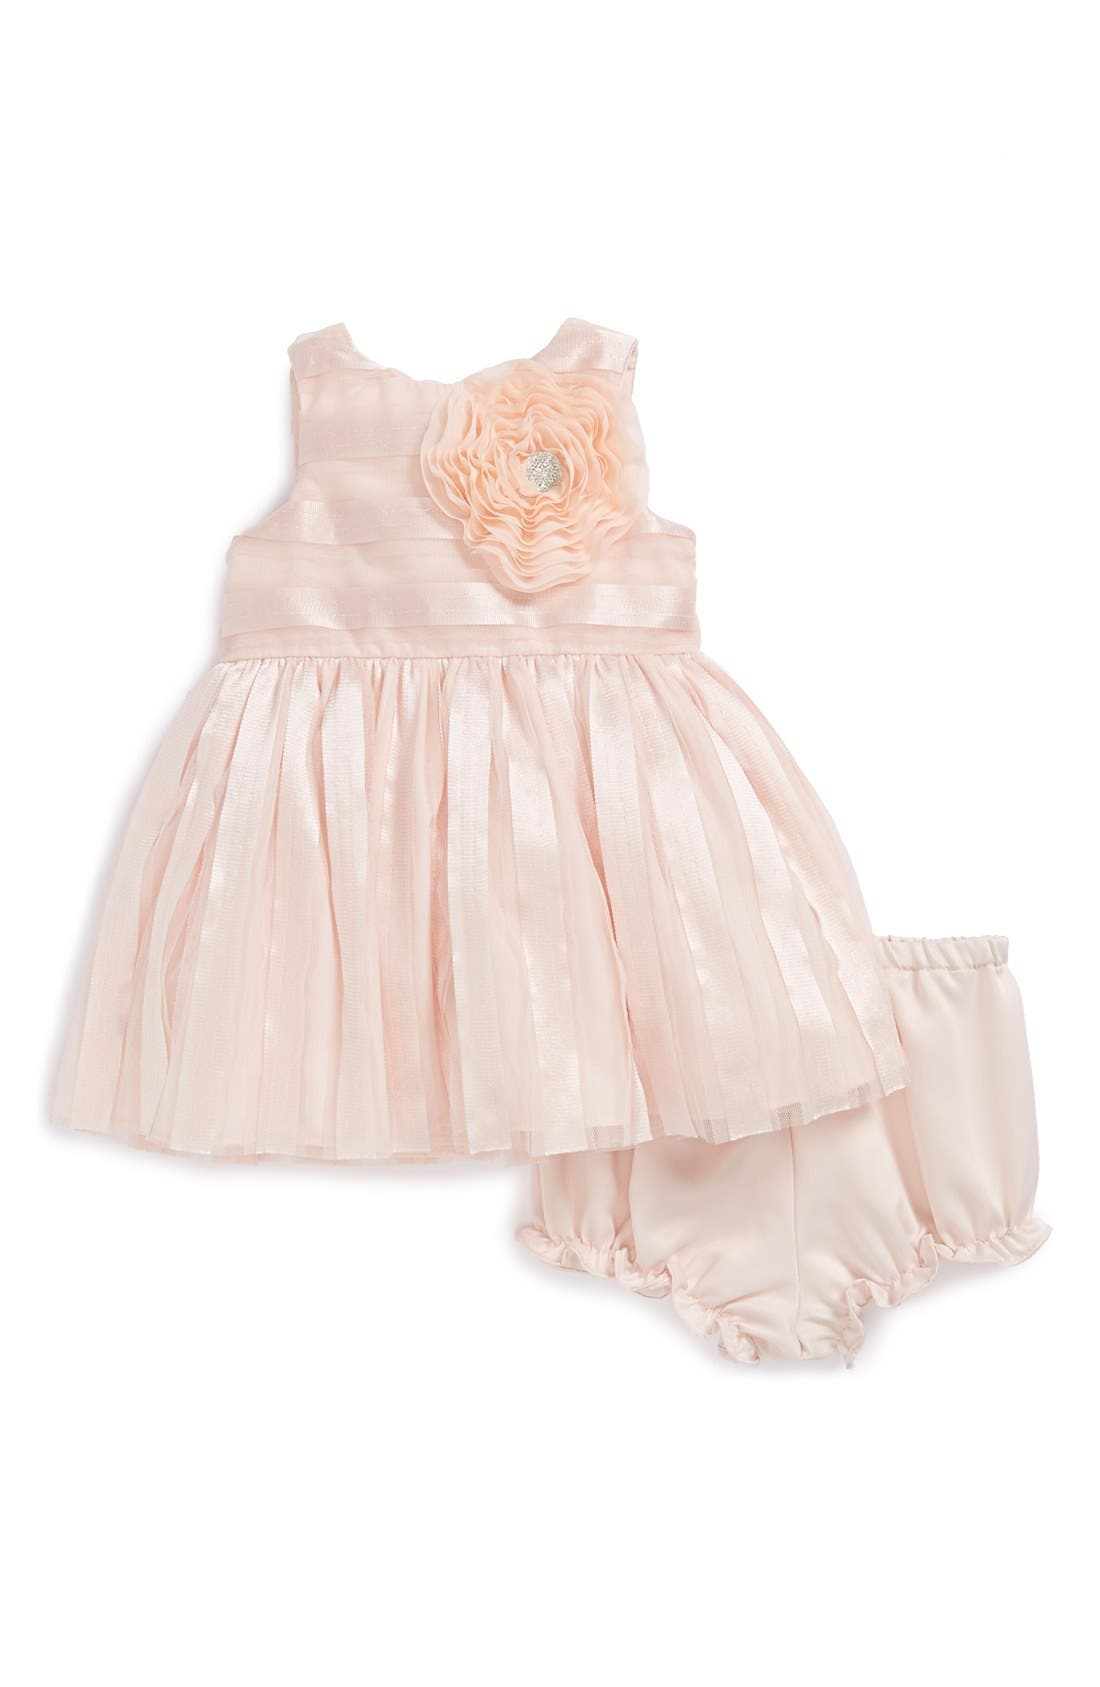 Main Image - Pippa & Julie Ribbon Stripe Dress & Bloomers (Baby Girls)